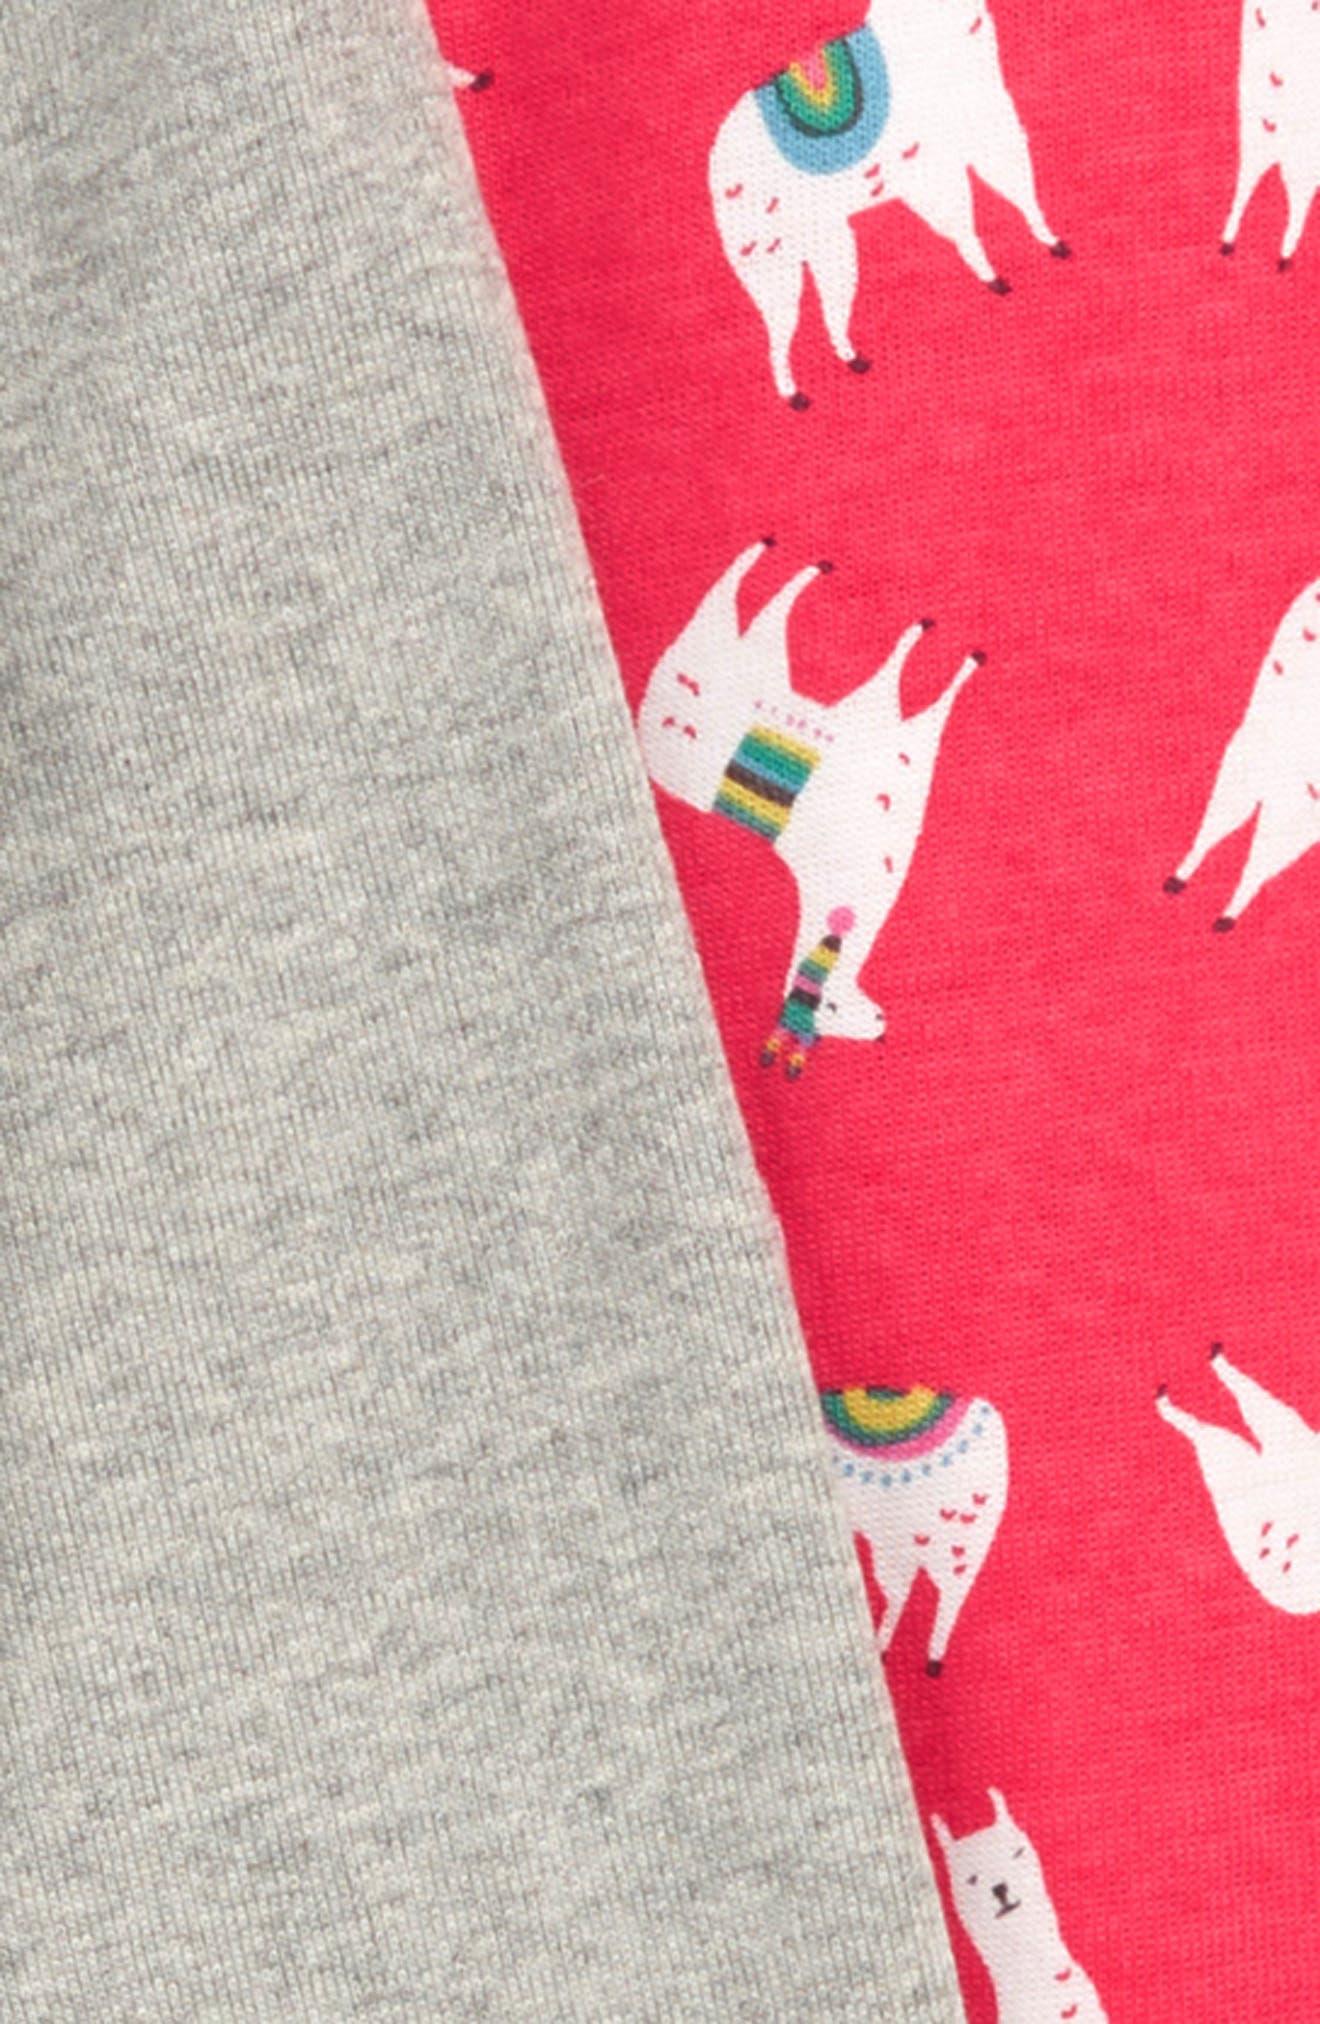 Fitted Cosy Long John Pajamas,                             Alternate thumbnail 2, color,                             BPK PINK BERRY LLAMAS